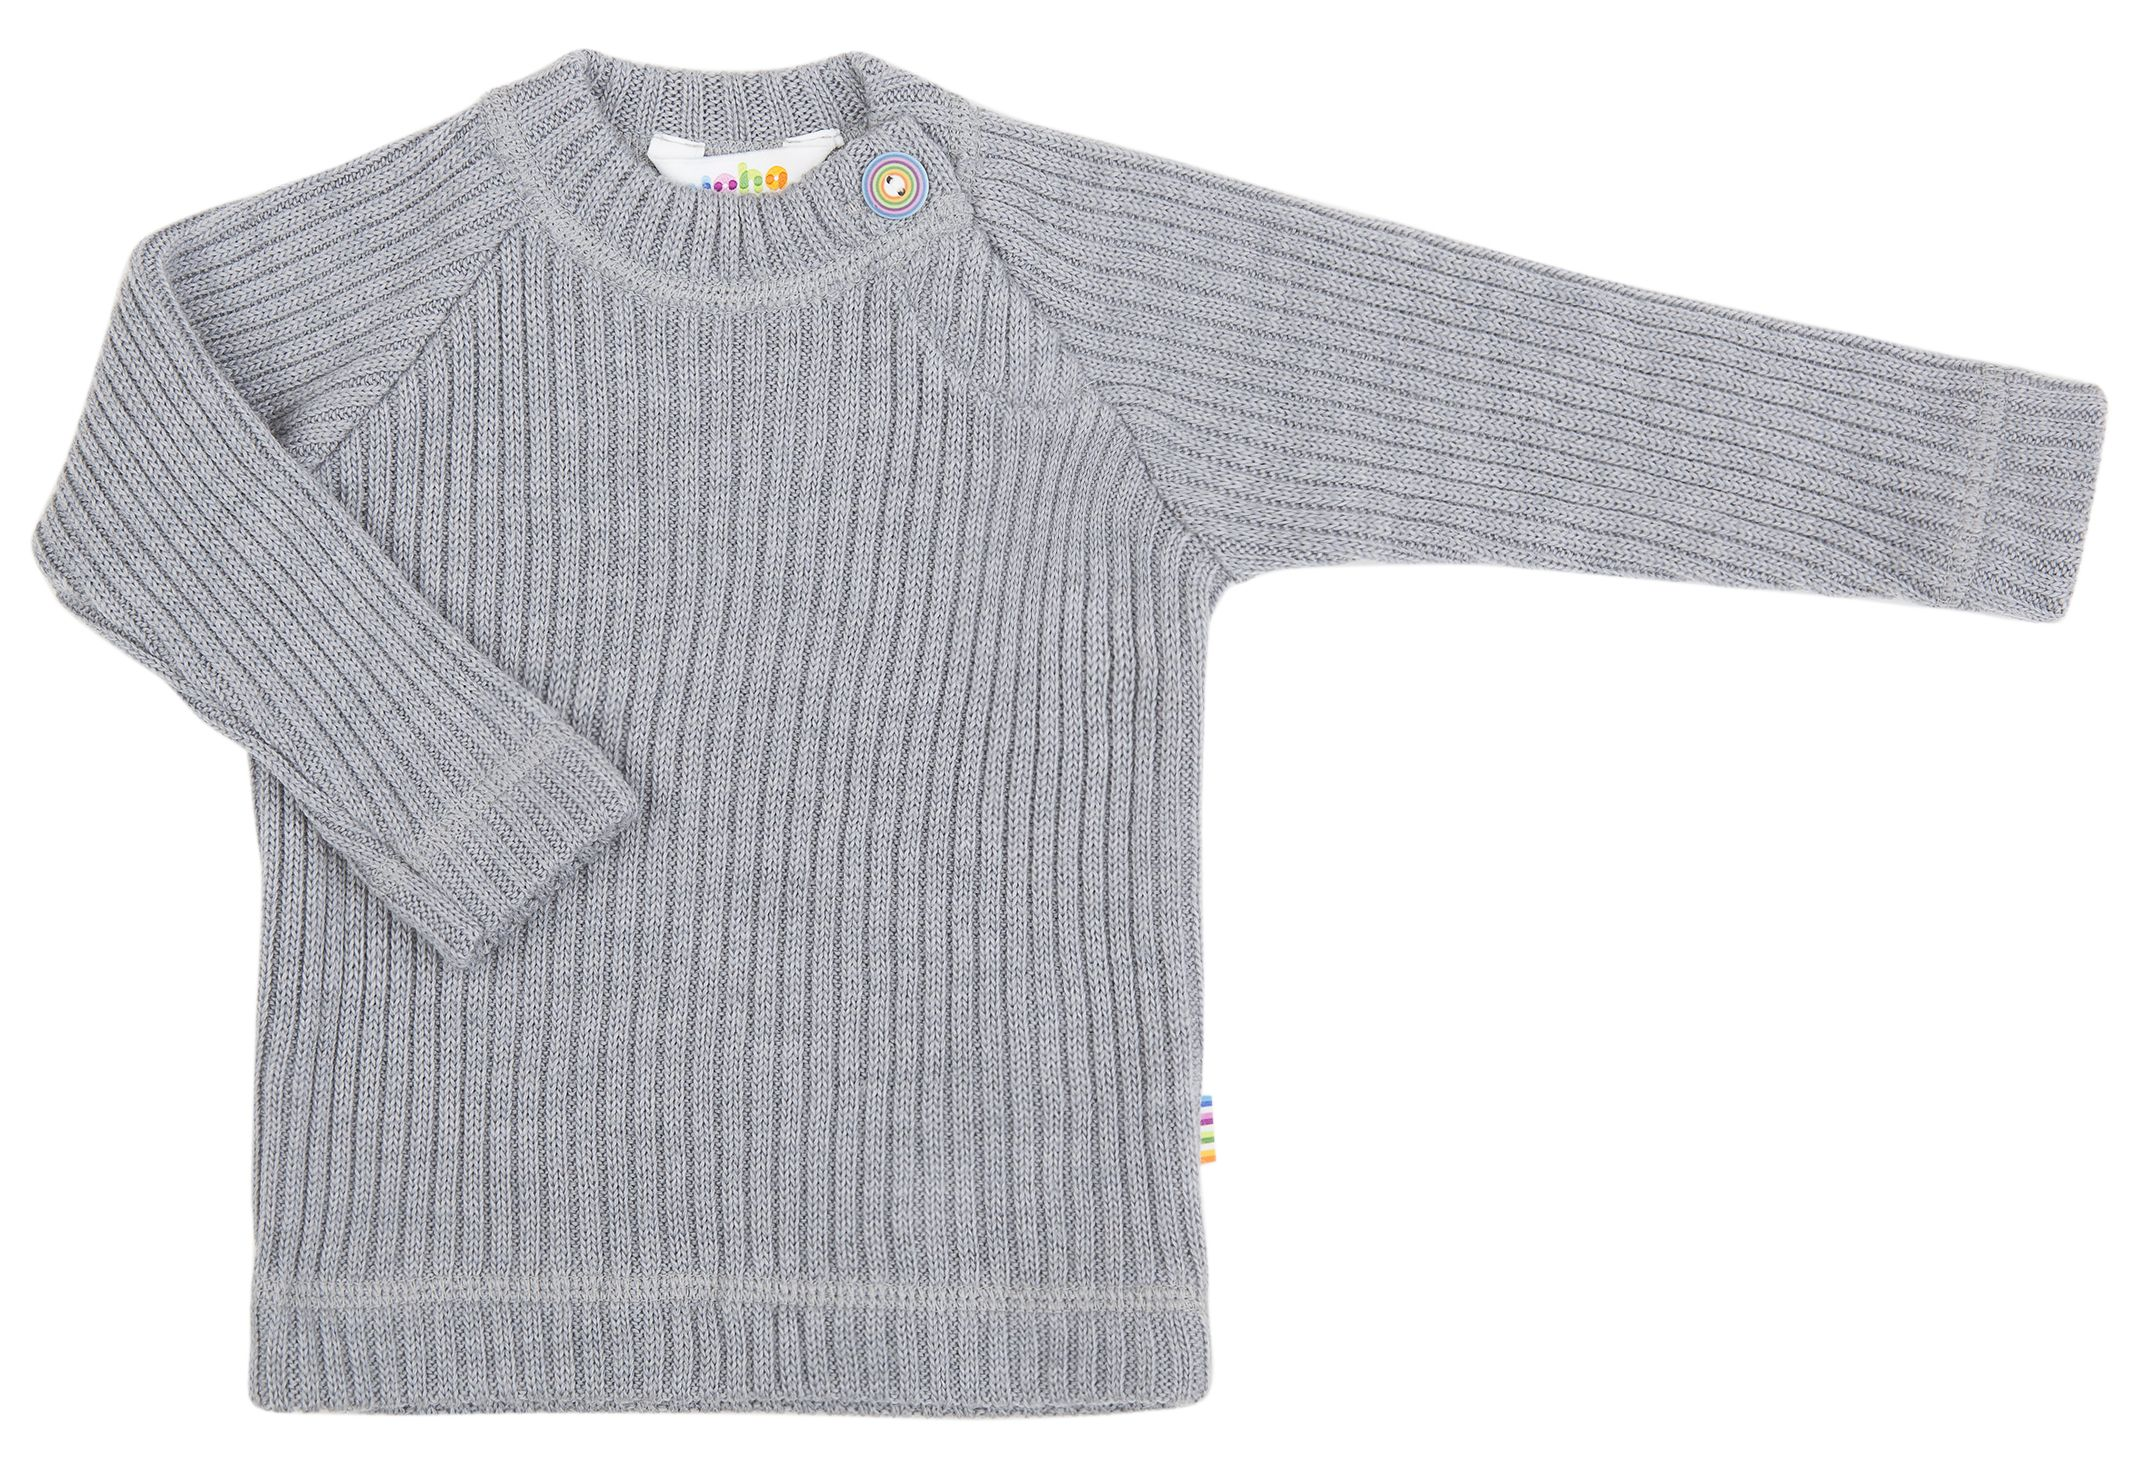 Image of   Bluse i Baby Uld (Soft Wool) fra Joha - Grey melange